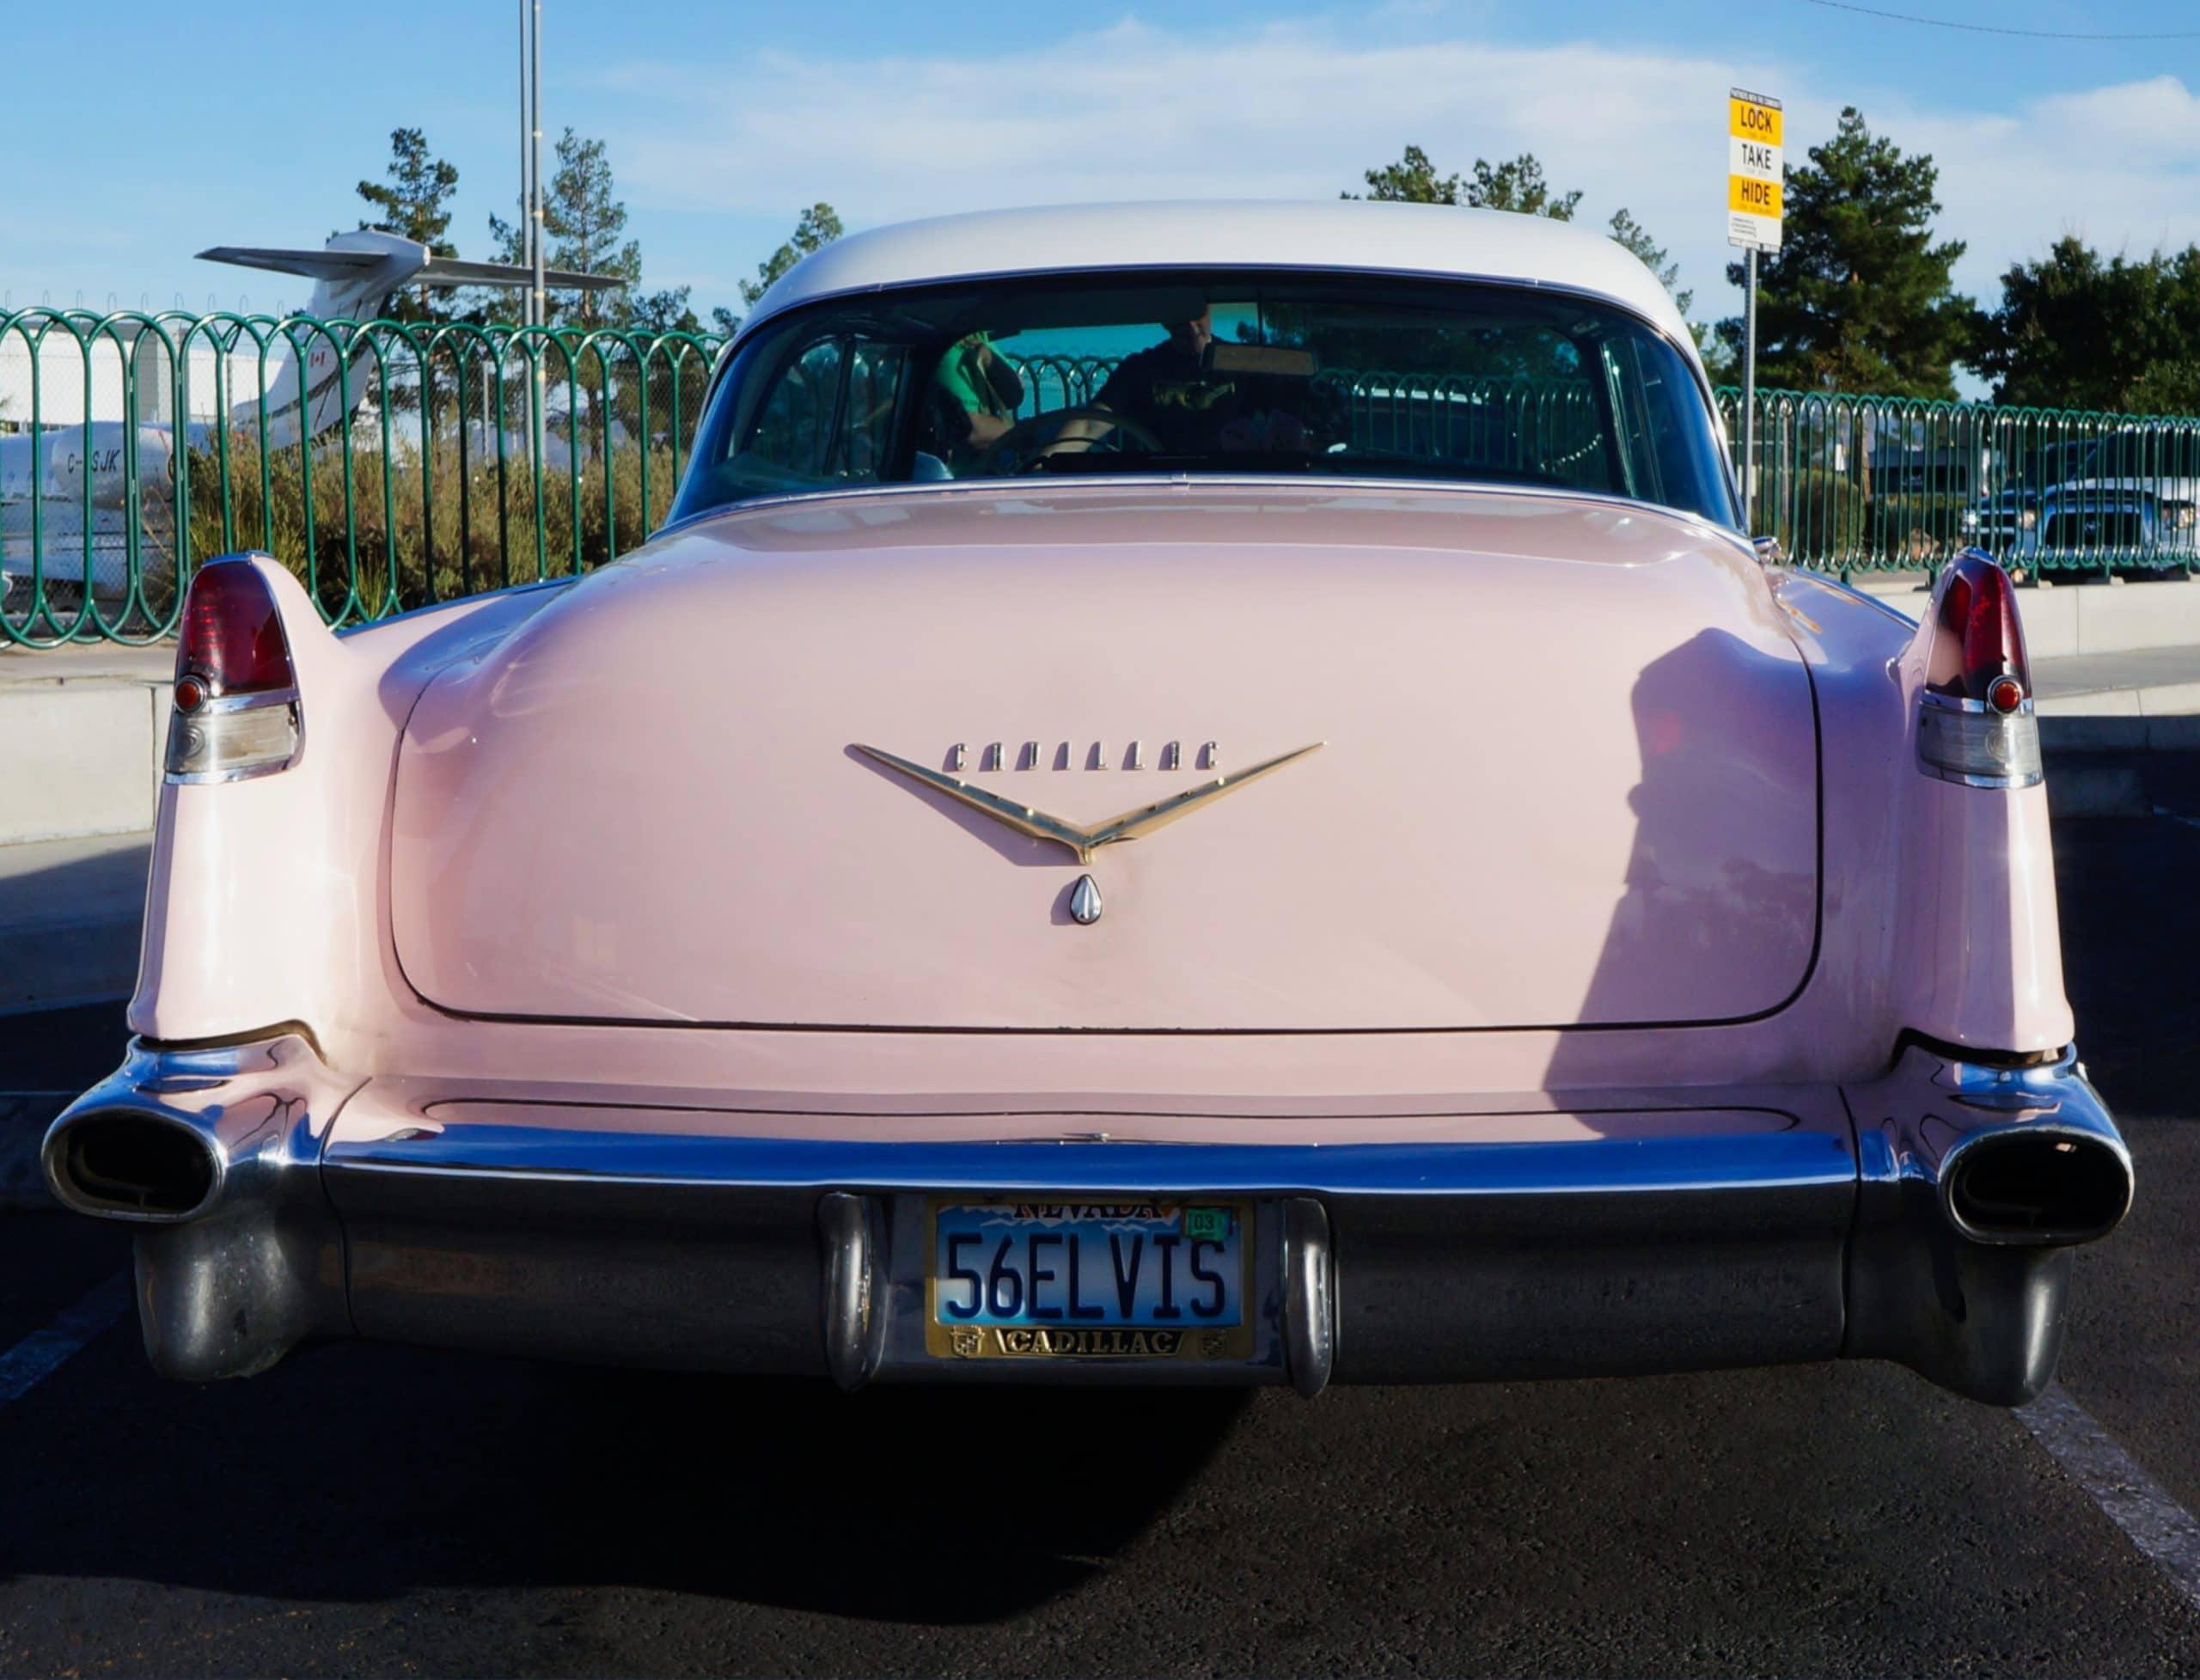 elvis presley license plate pink cadillac